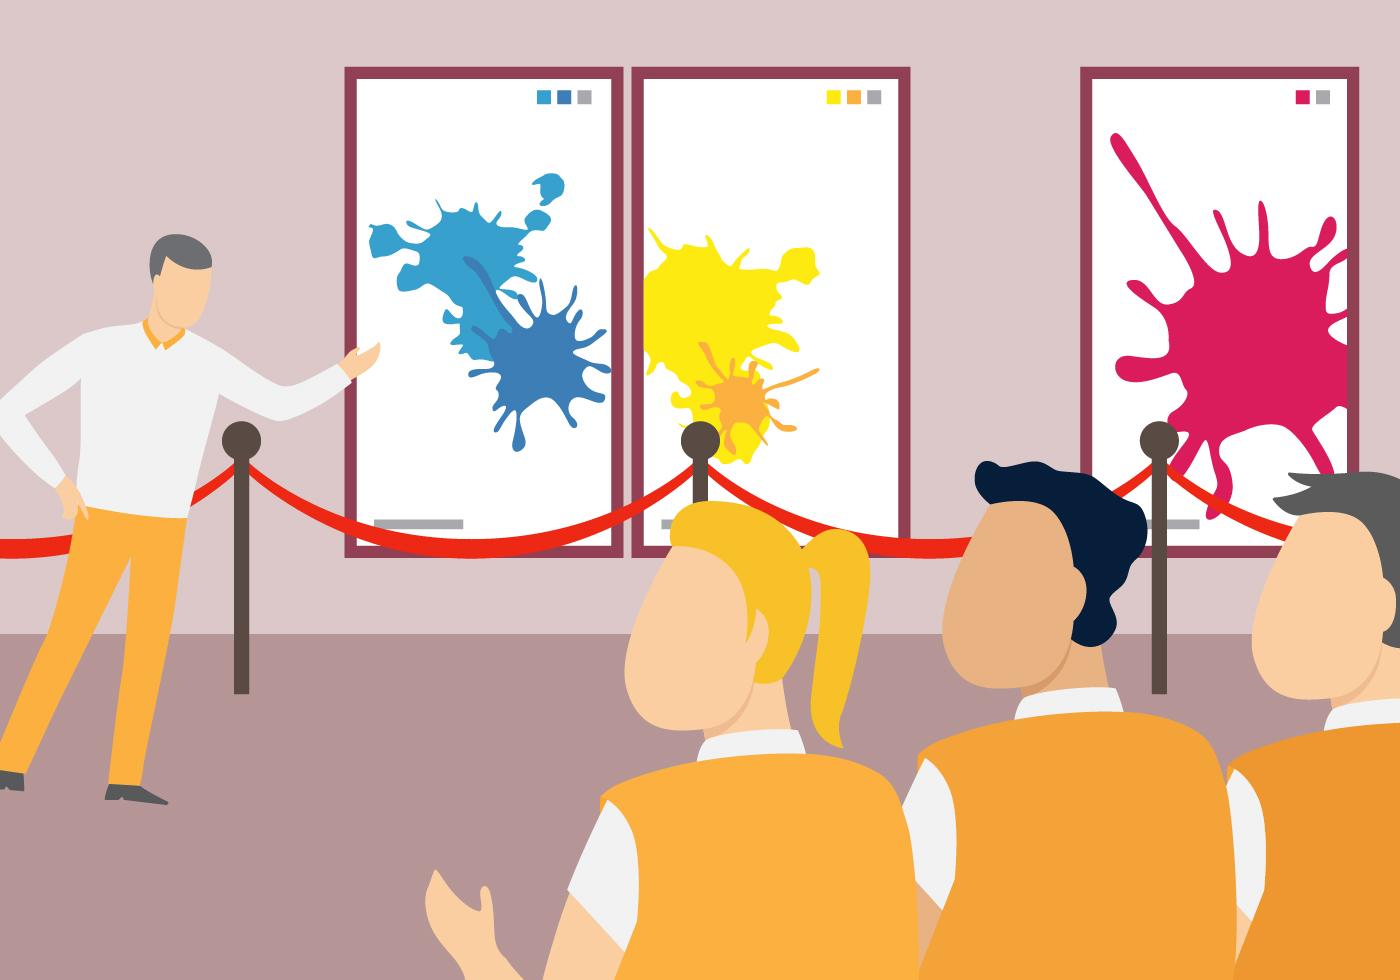 Exhibition Hall Free Vector Art.